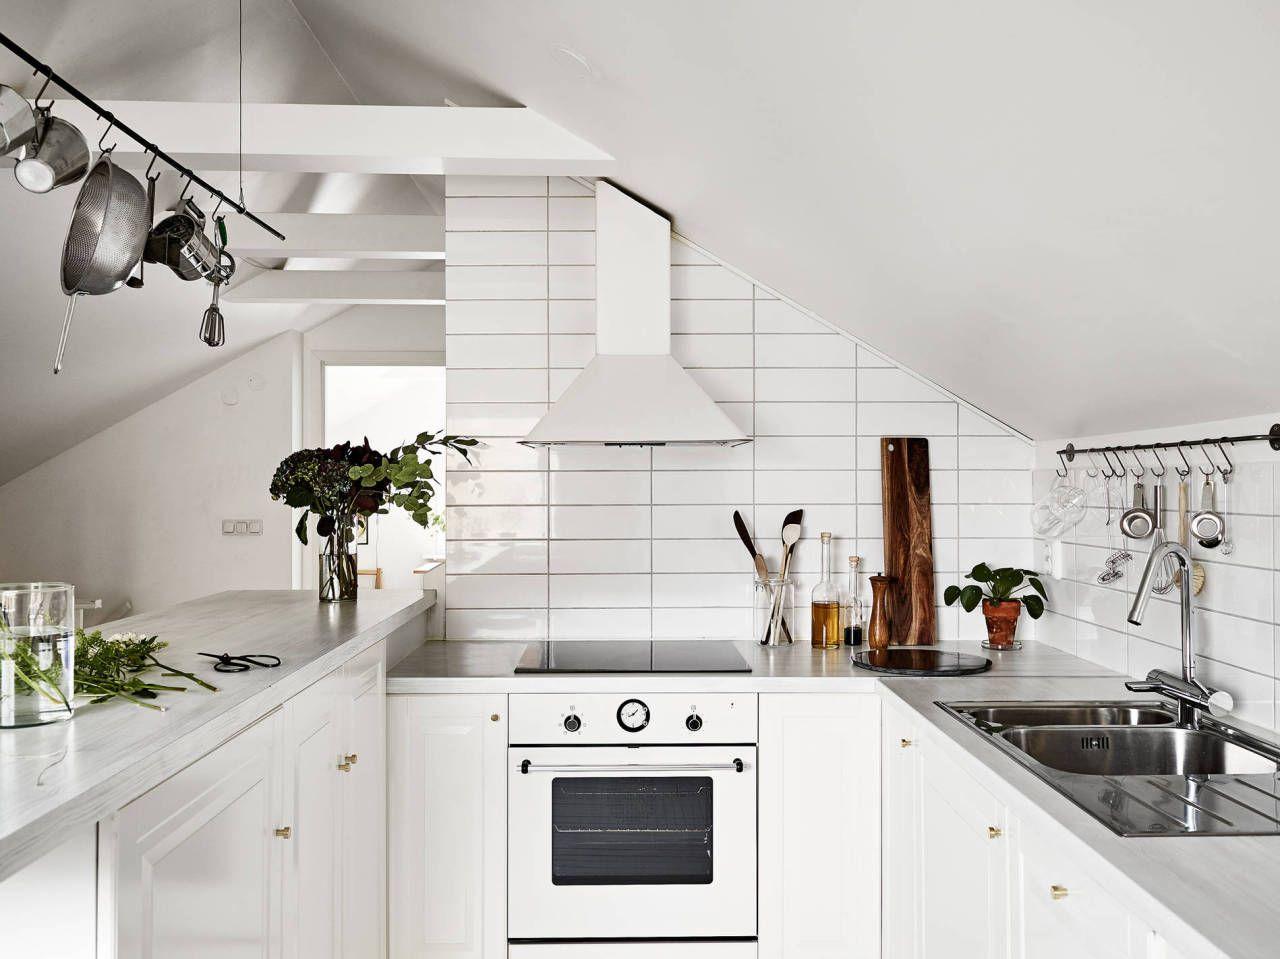 Pop out kitchen window  diy bedrooms u gravitygravity photography by janne olander